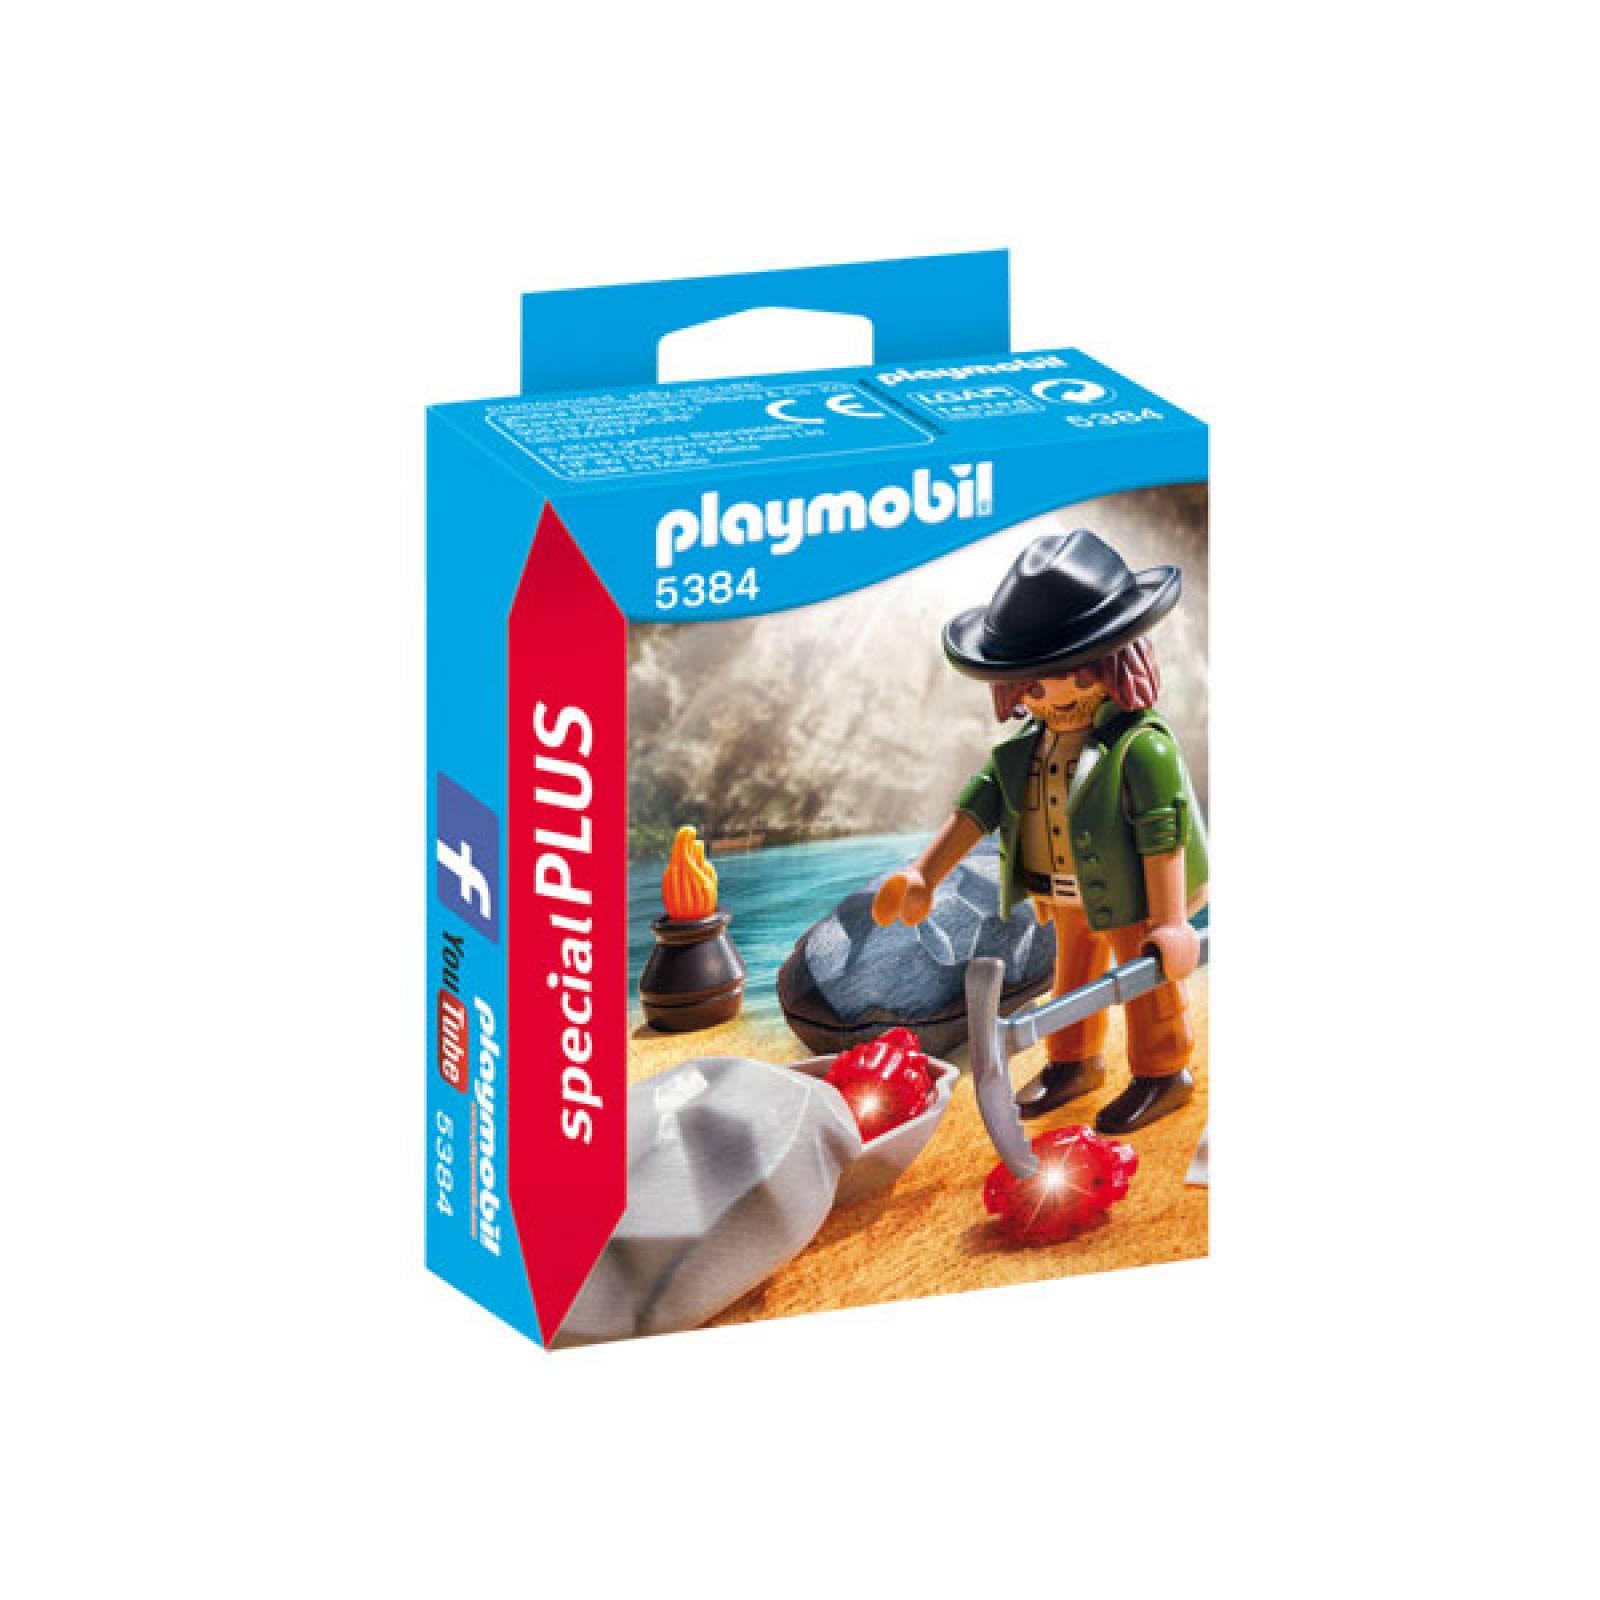 Z Gem Hunter Special Plus Playmobil 5384 thumbnails